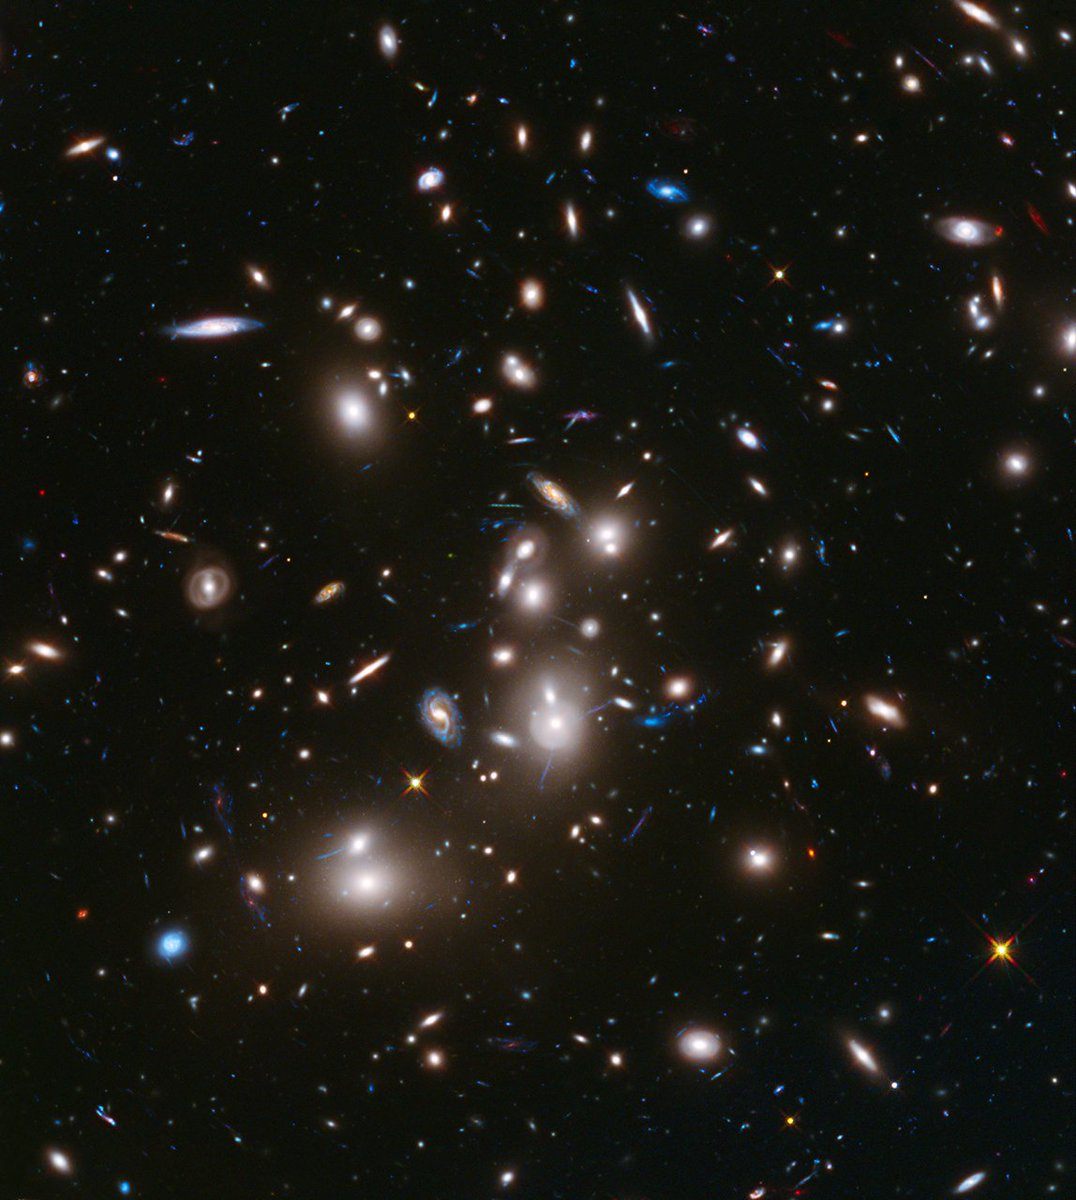 #Hubble30